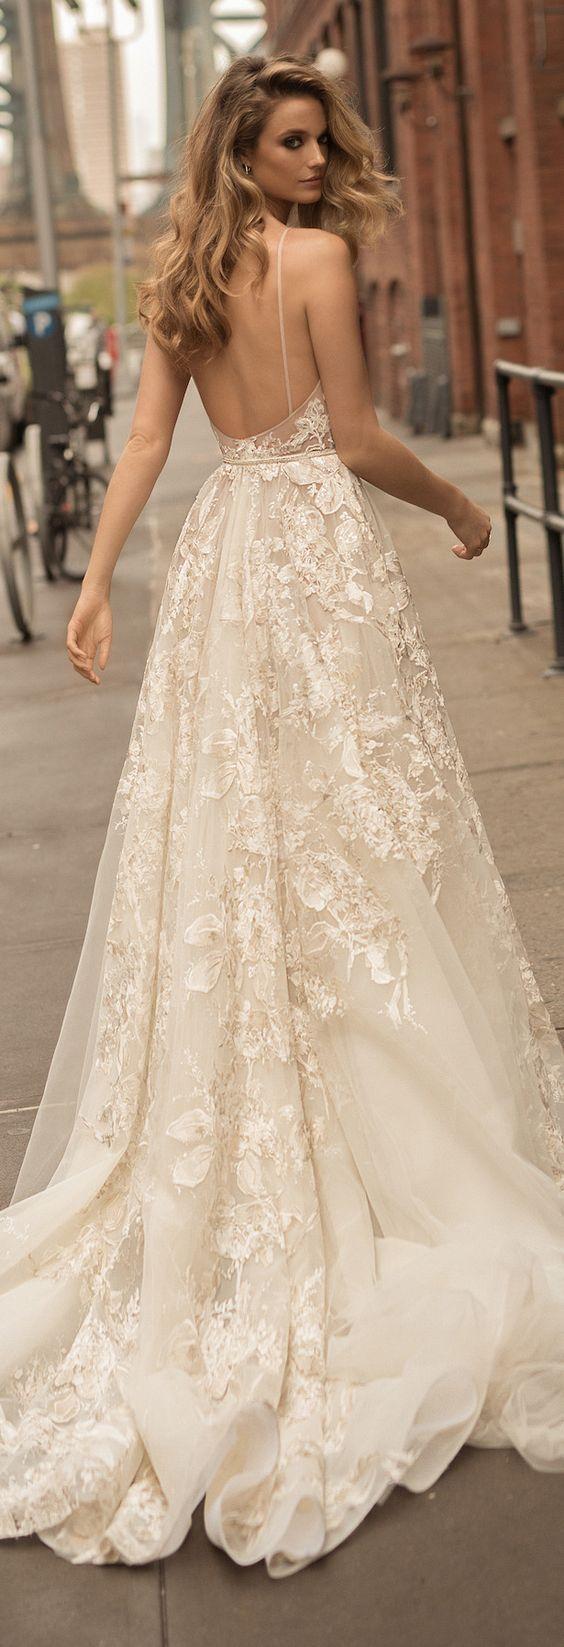 Women fashion dresses dresses for women womens clothes